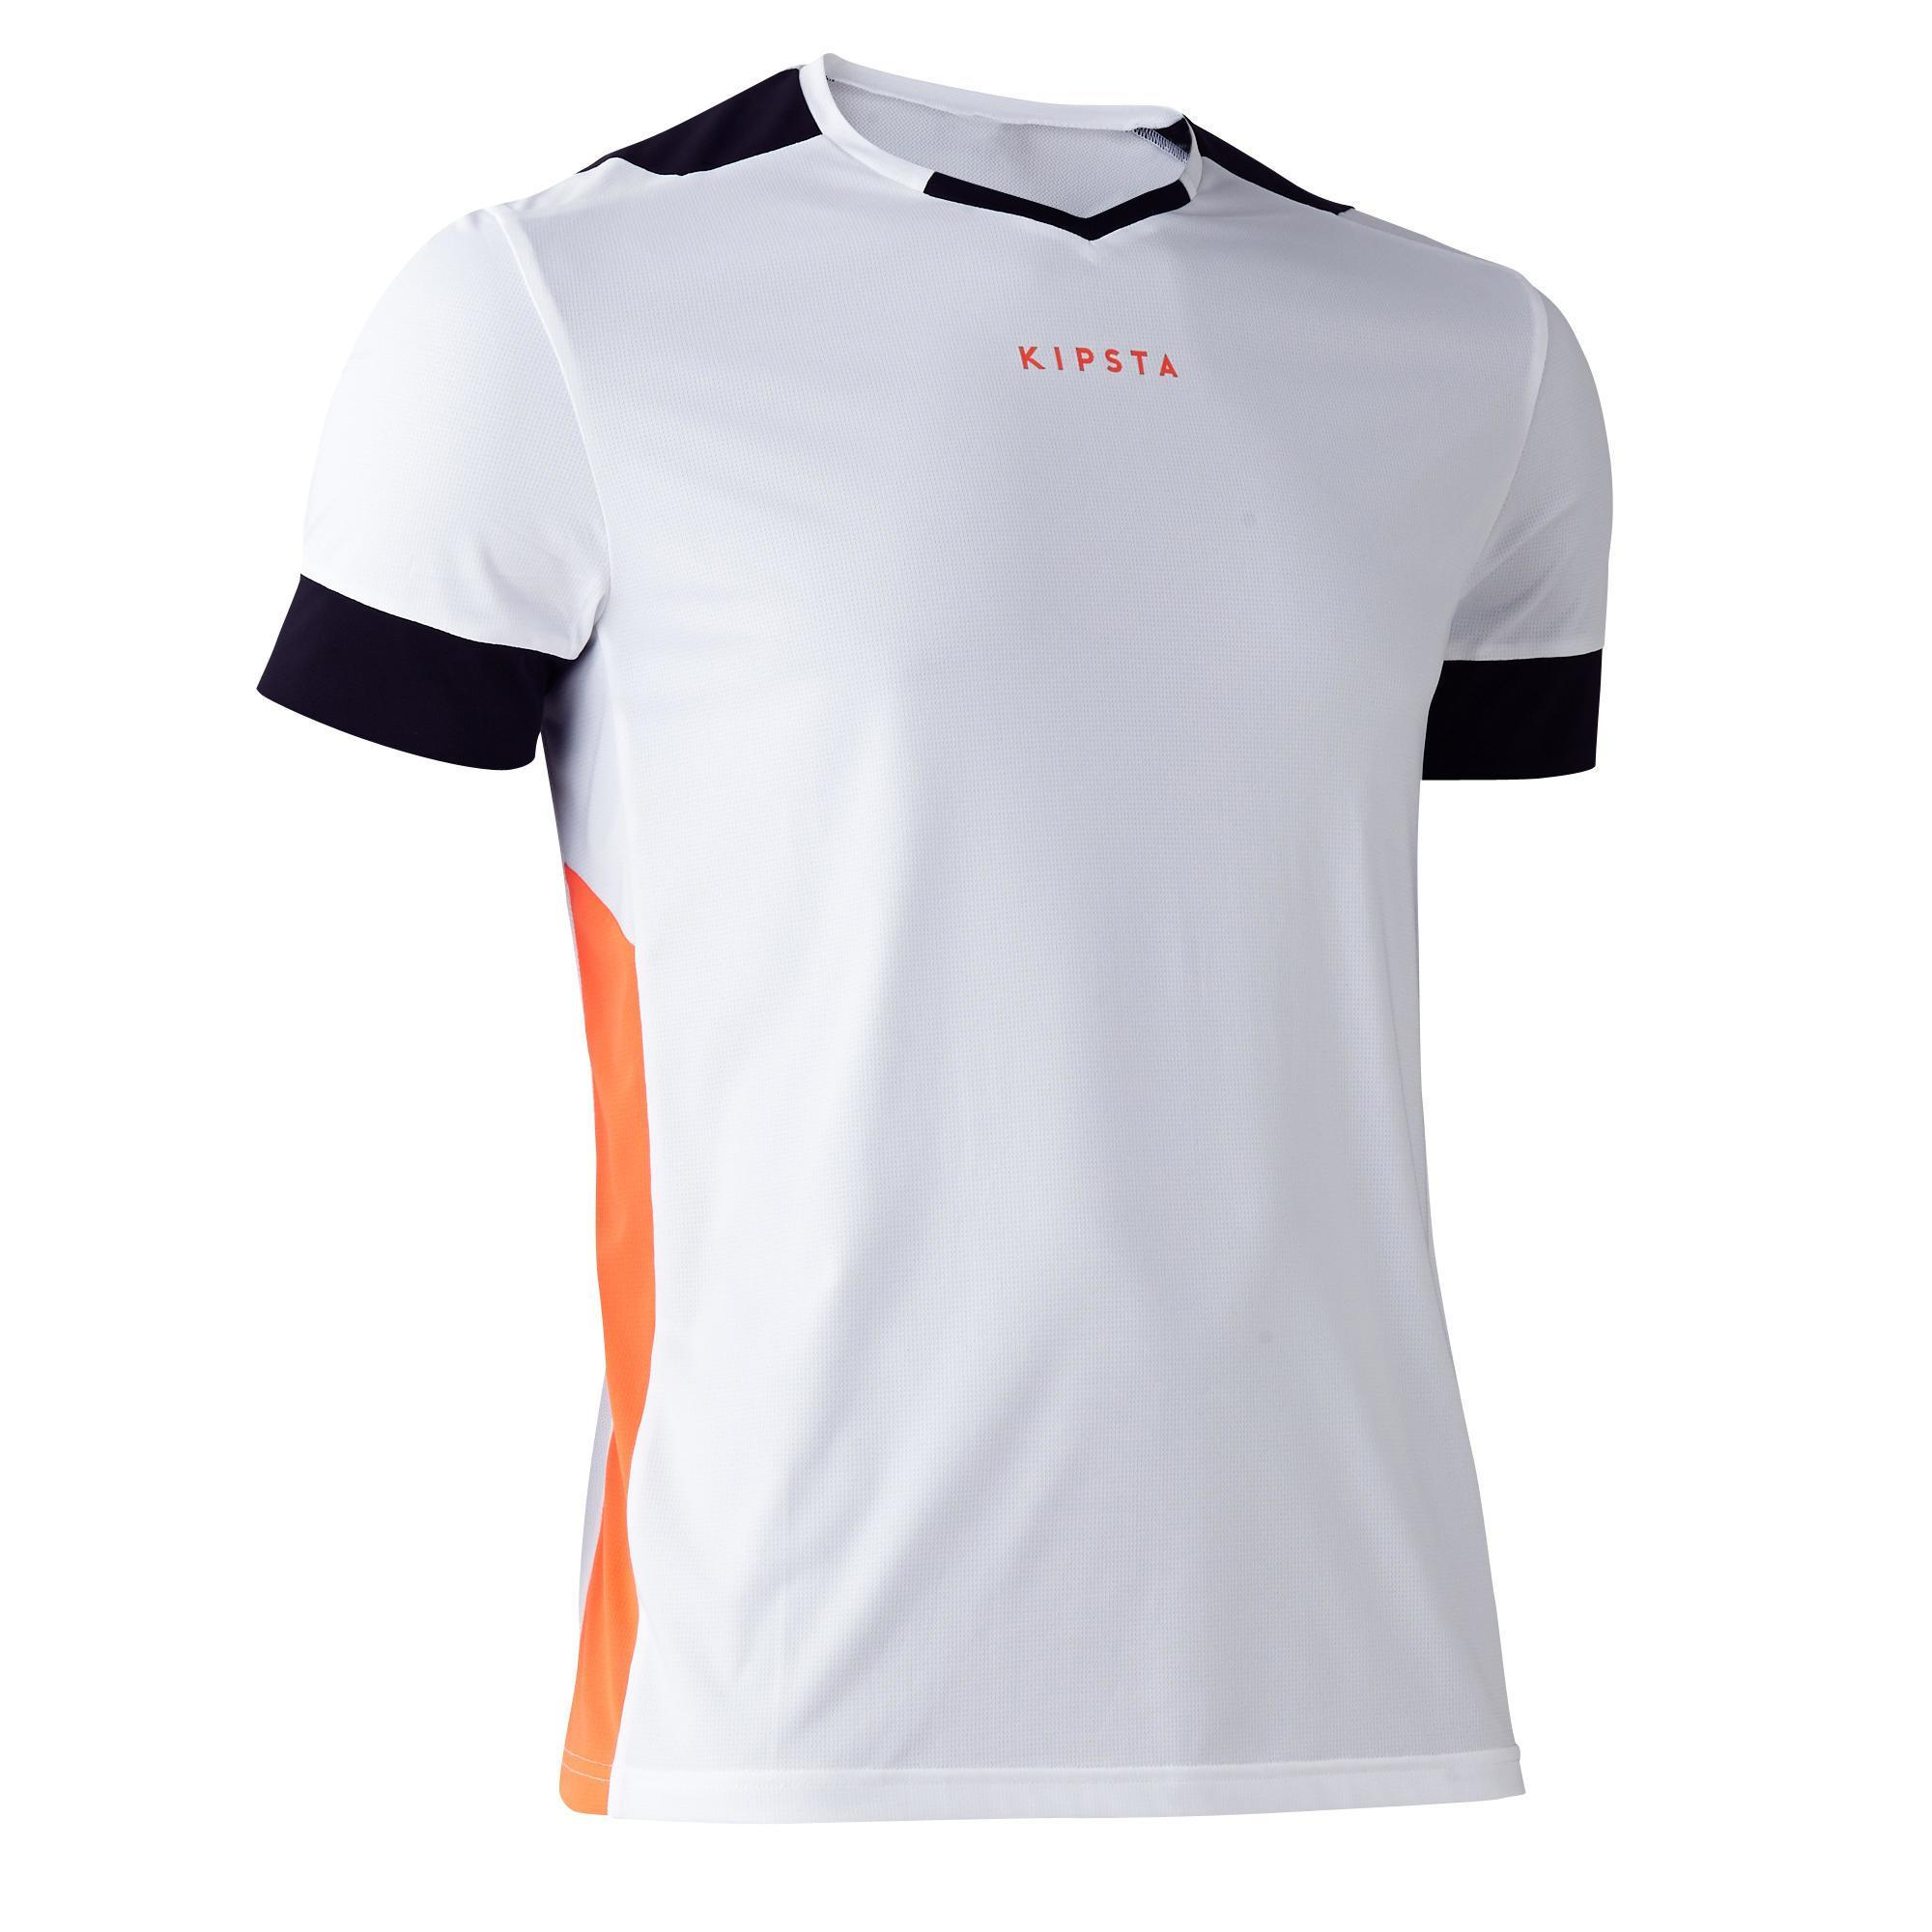 Fußballtrikot F500 Erwachsene weiß | Sportbekleidung > Trikots | Orange | Trikot | Kipsta